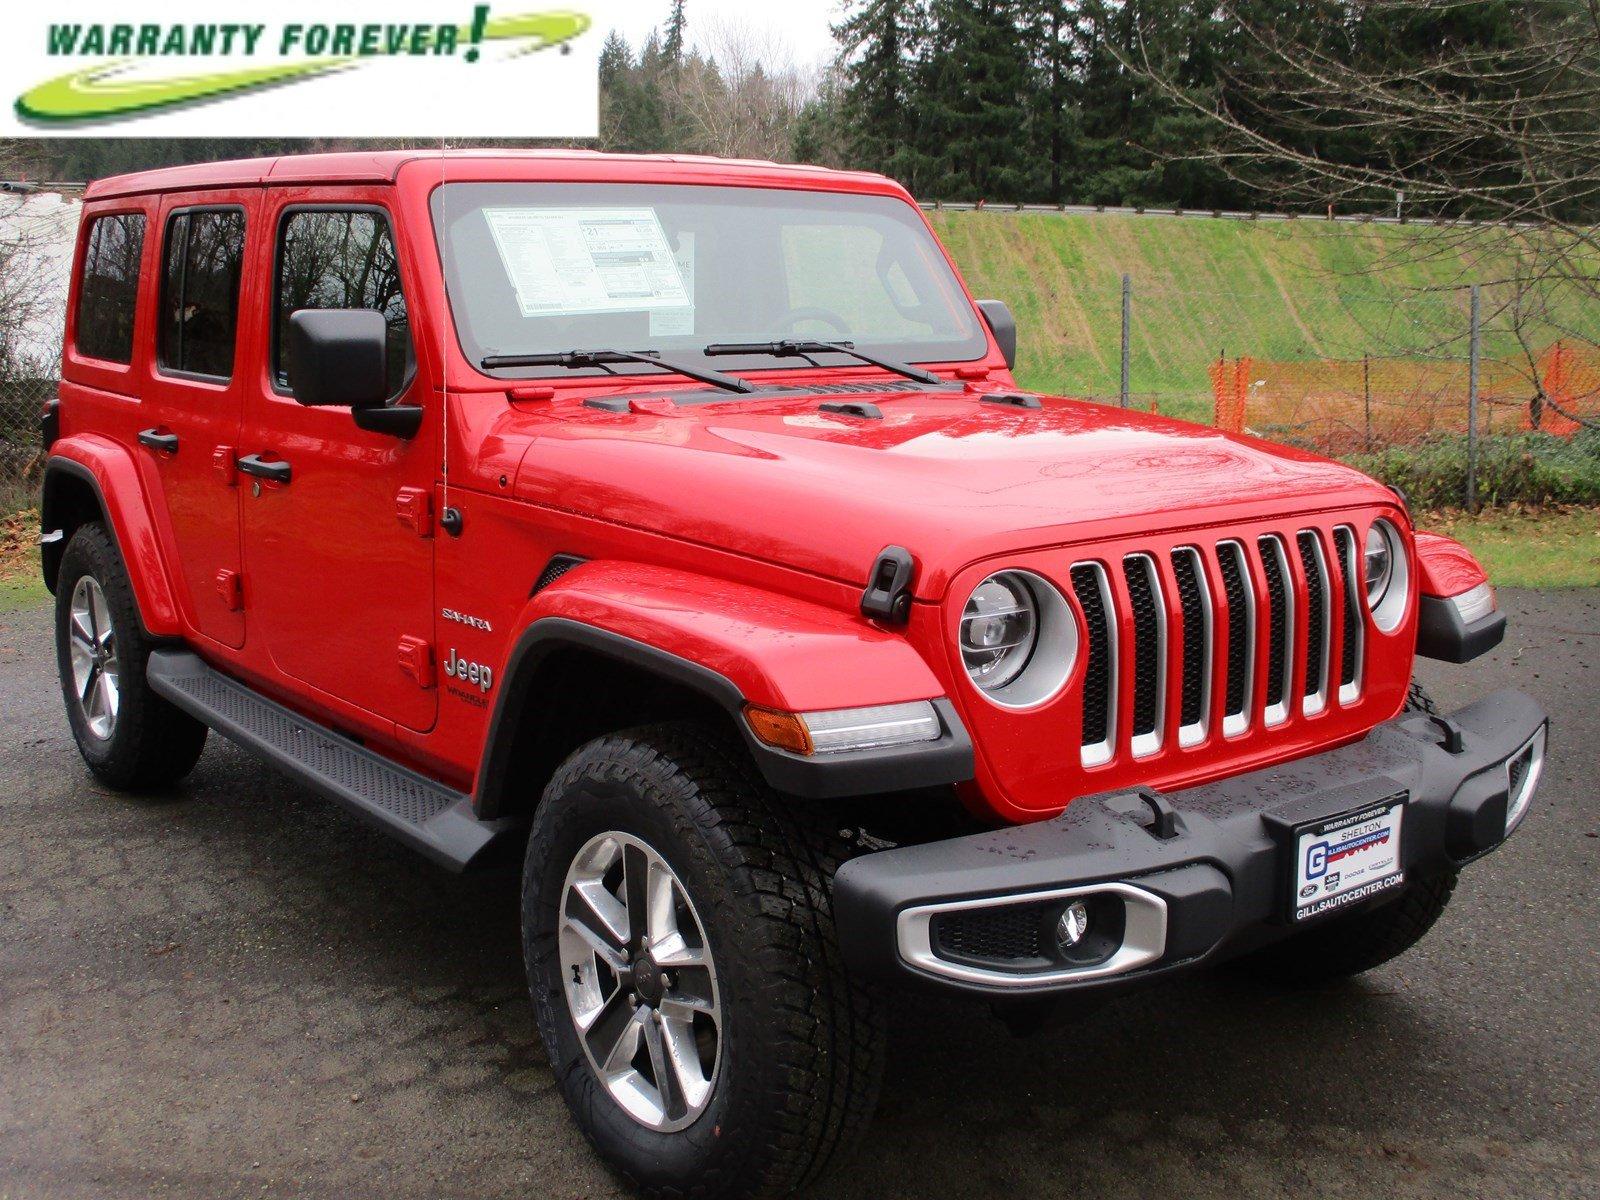 New 2020 Jeep Wrangler Unlimited Sahara 4x4